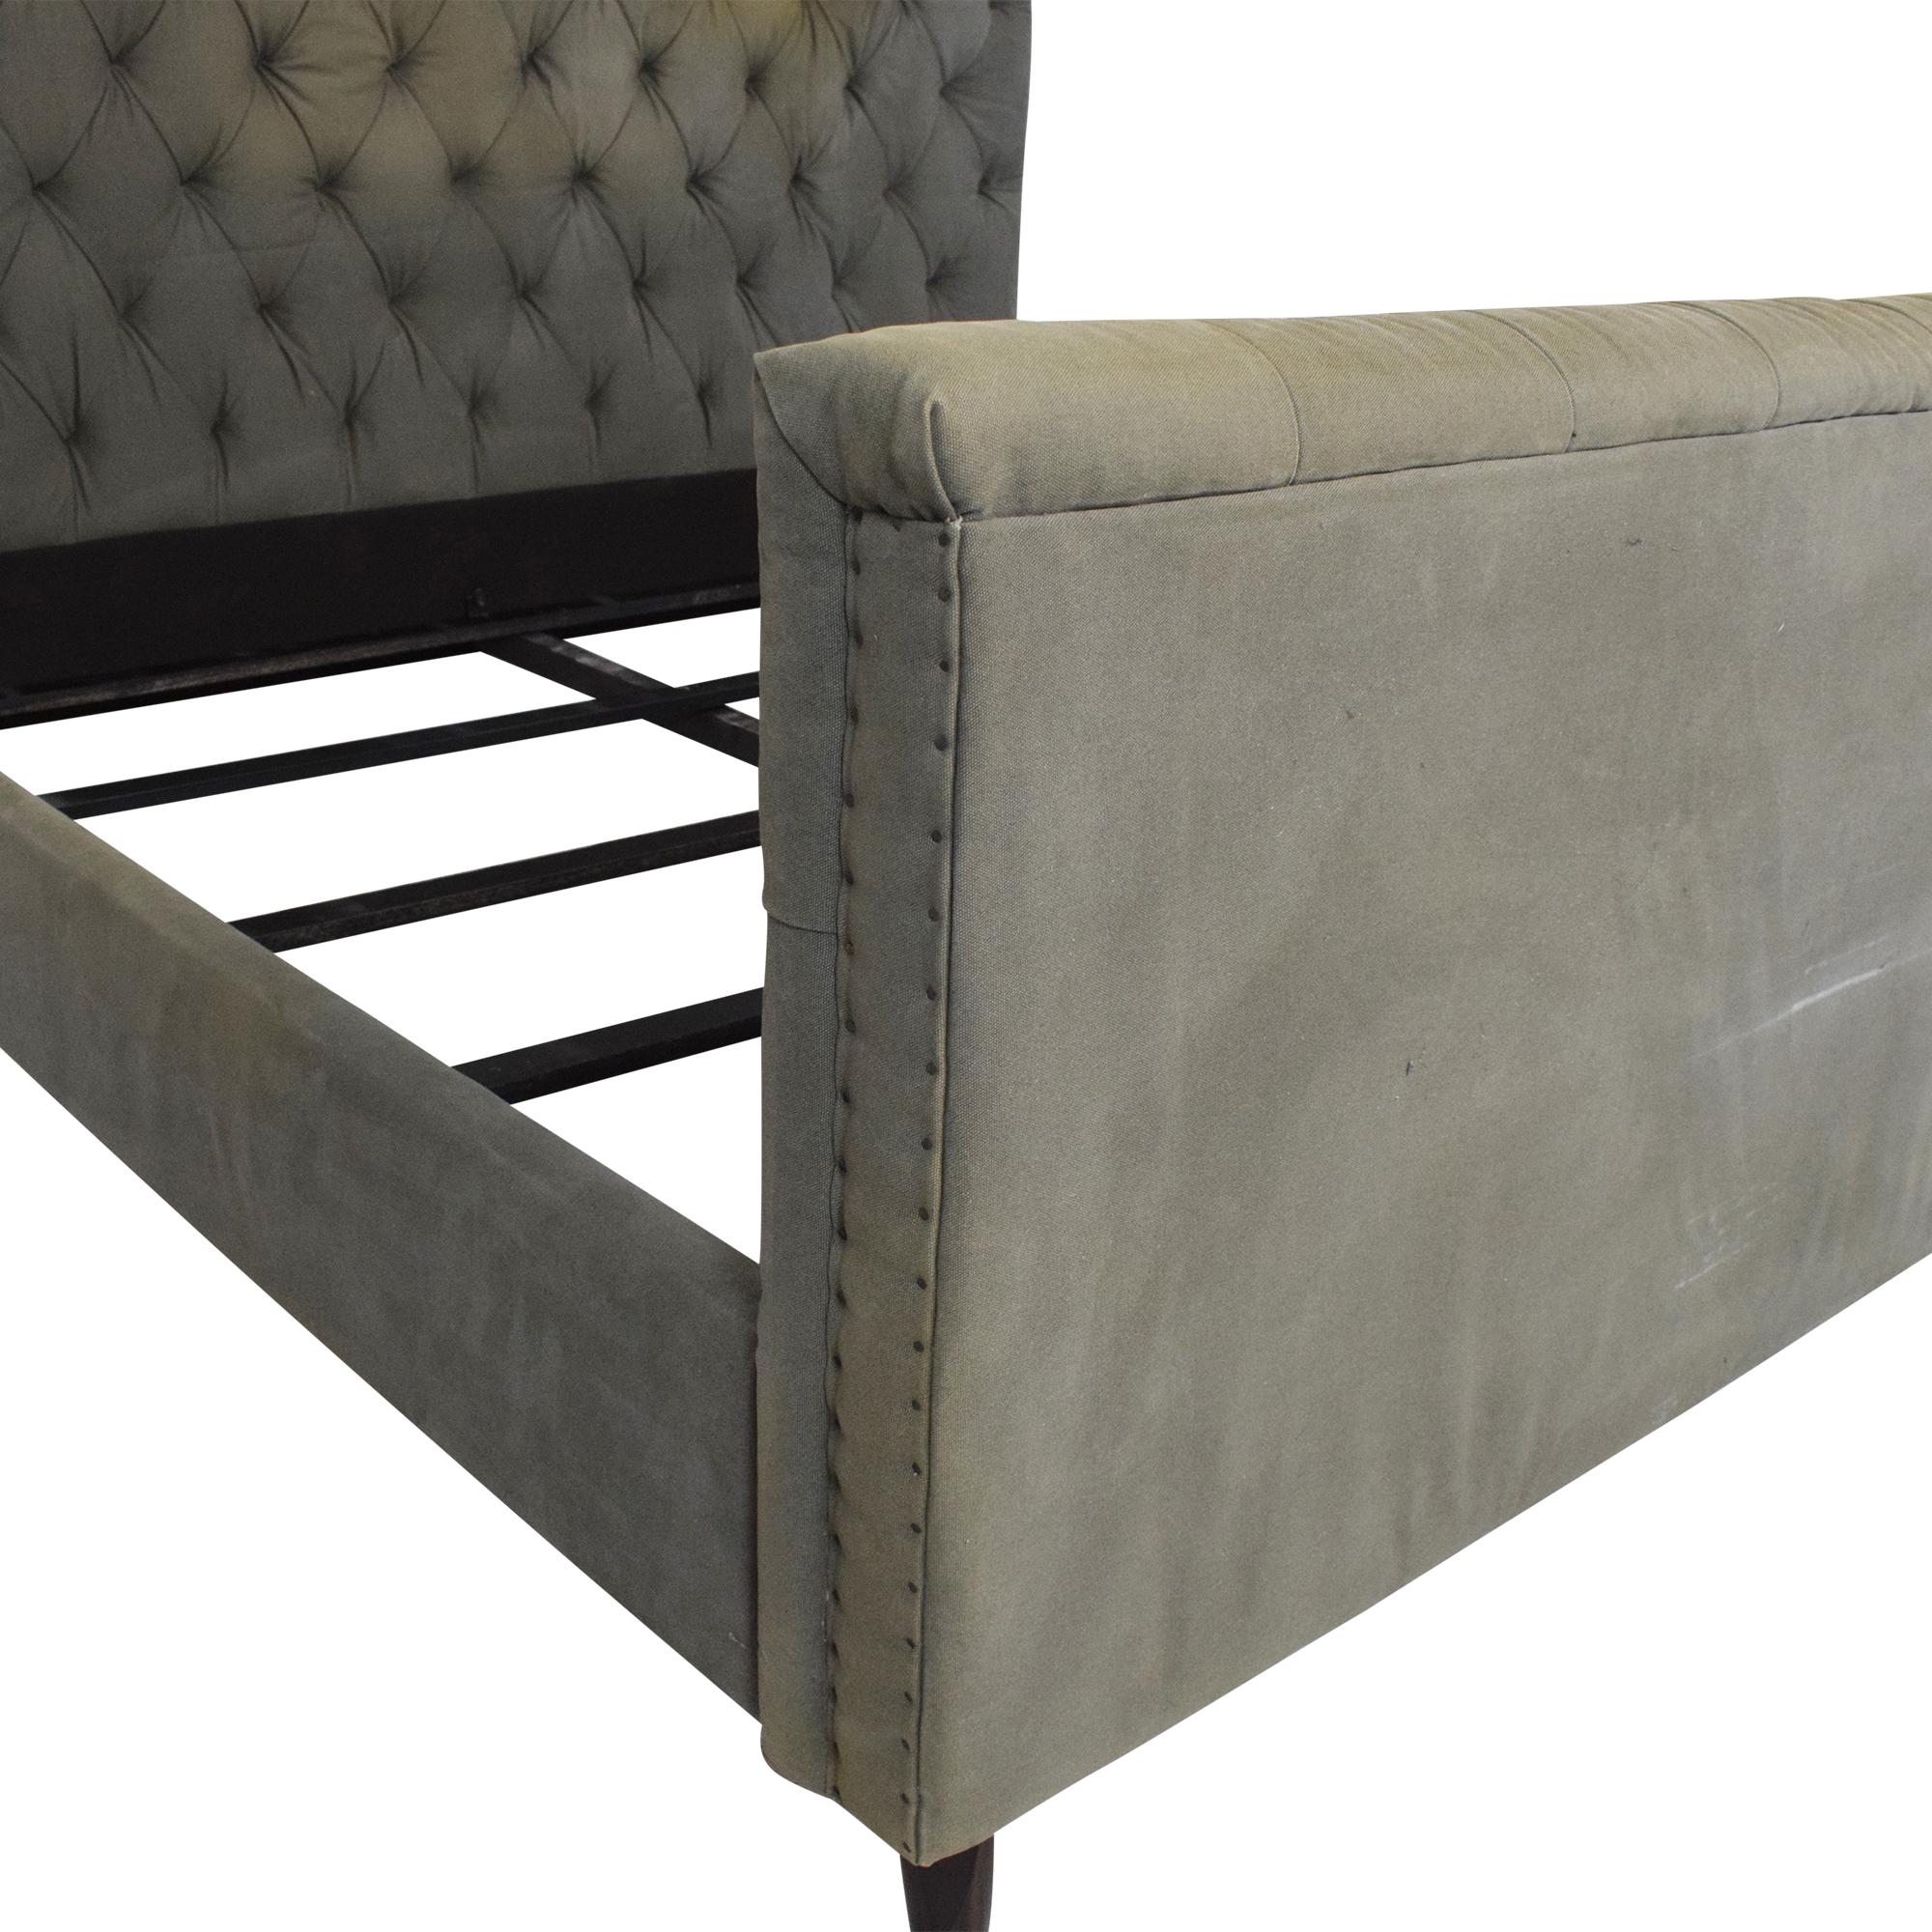 Restoration Hardware Chesterfield King Bed / Bed Frames